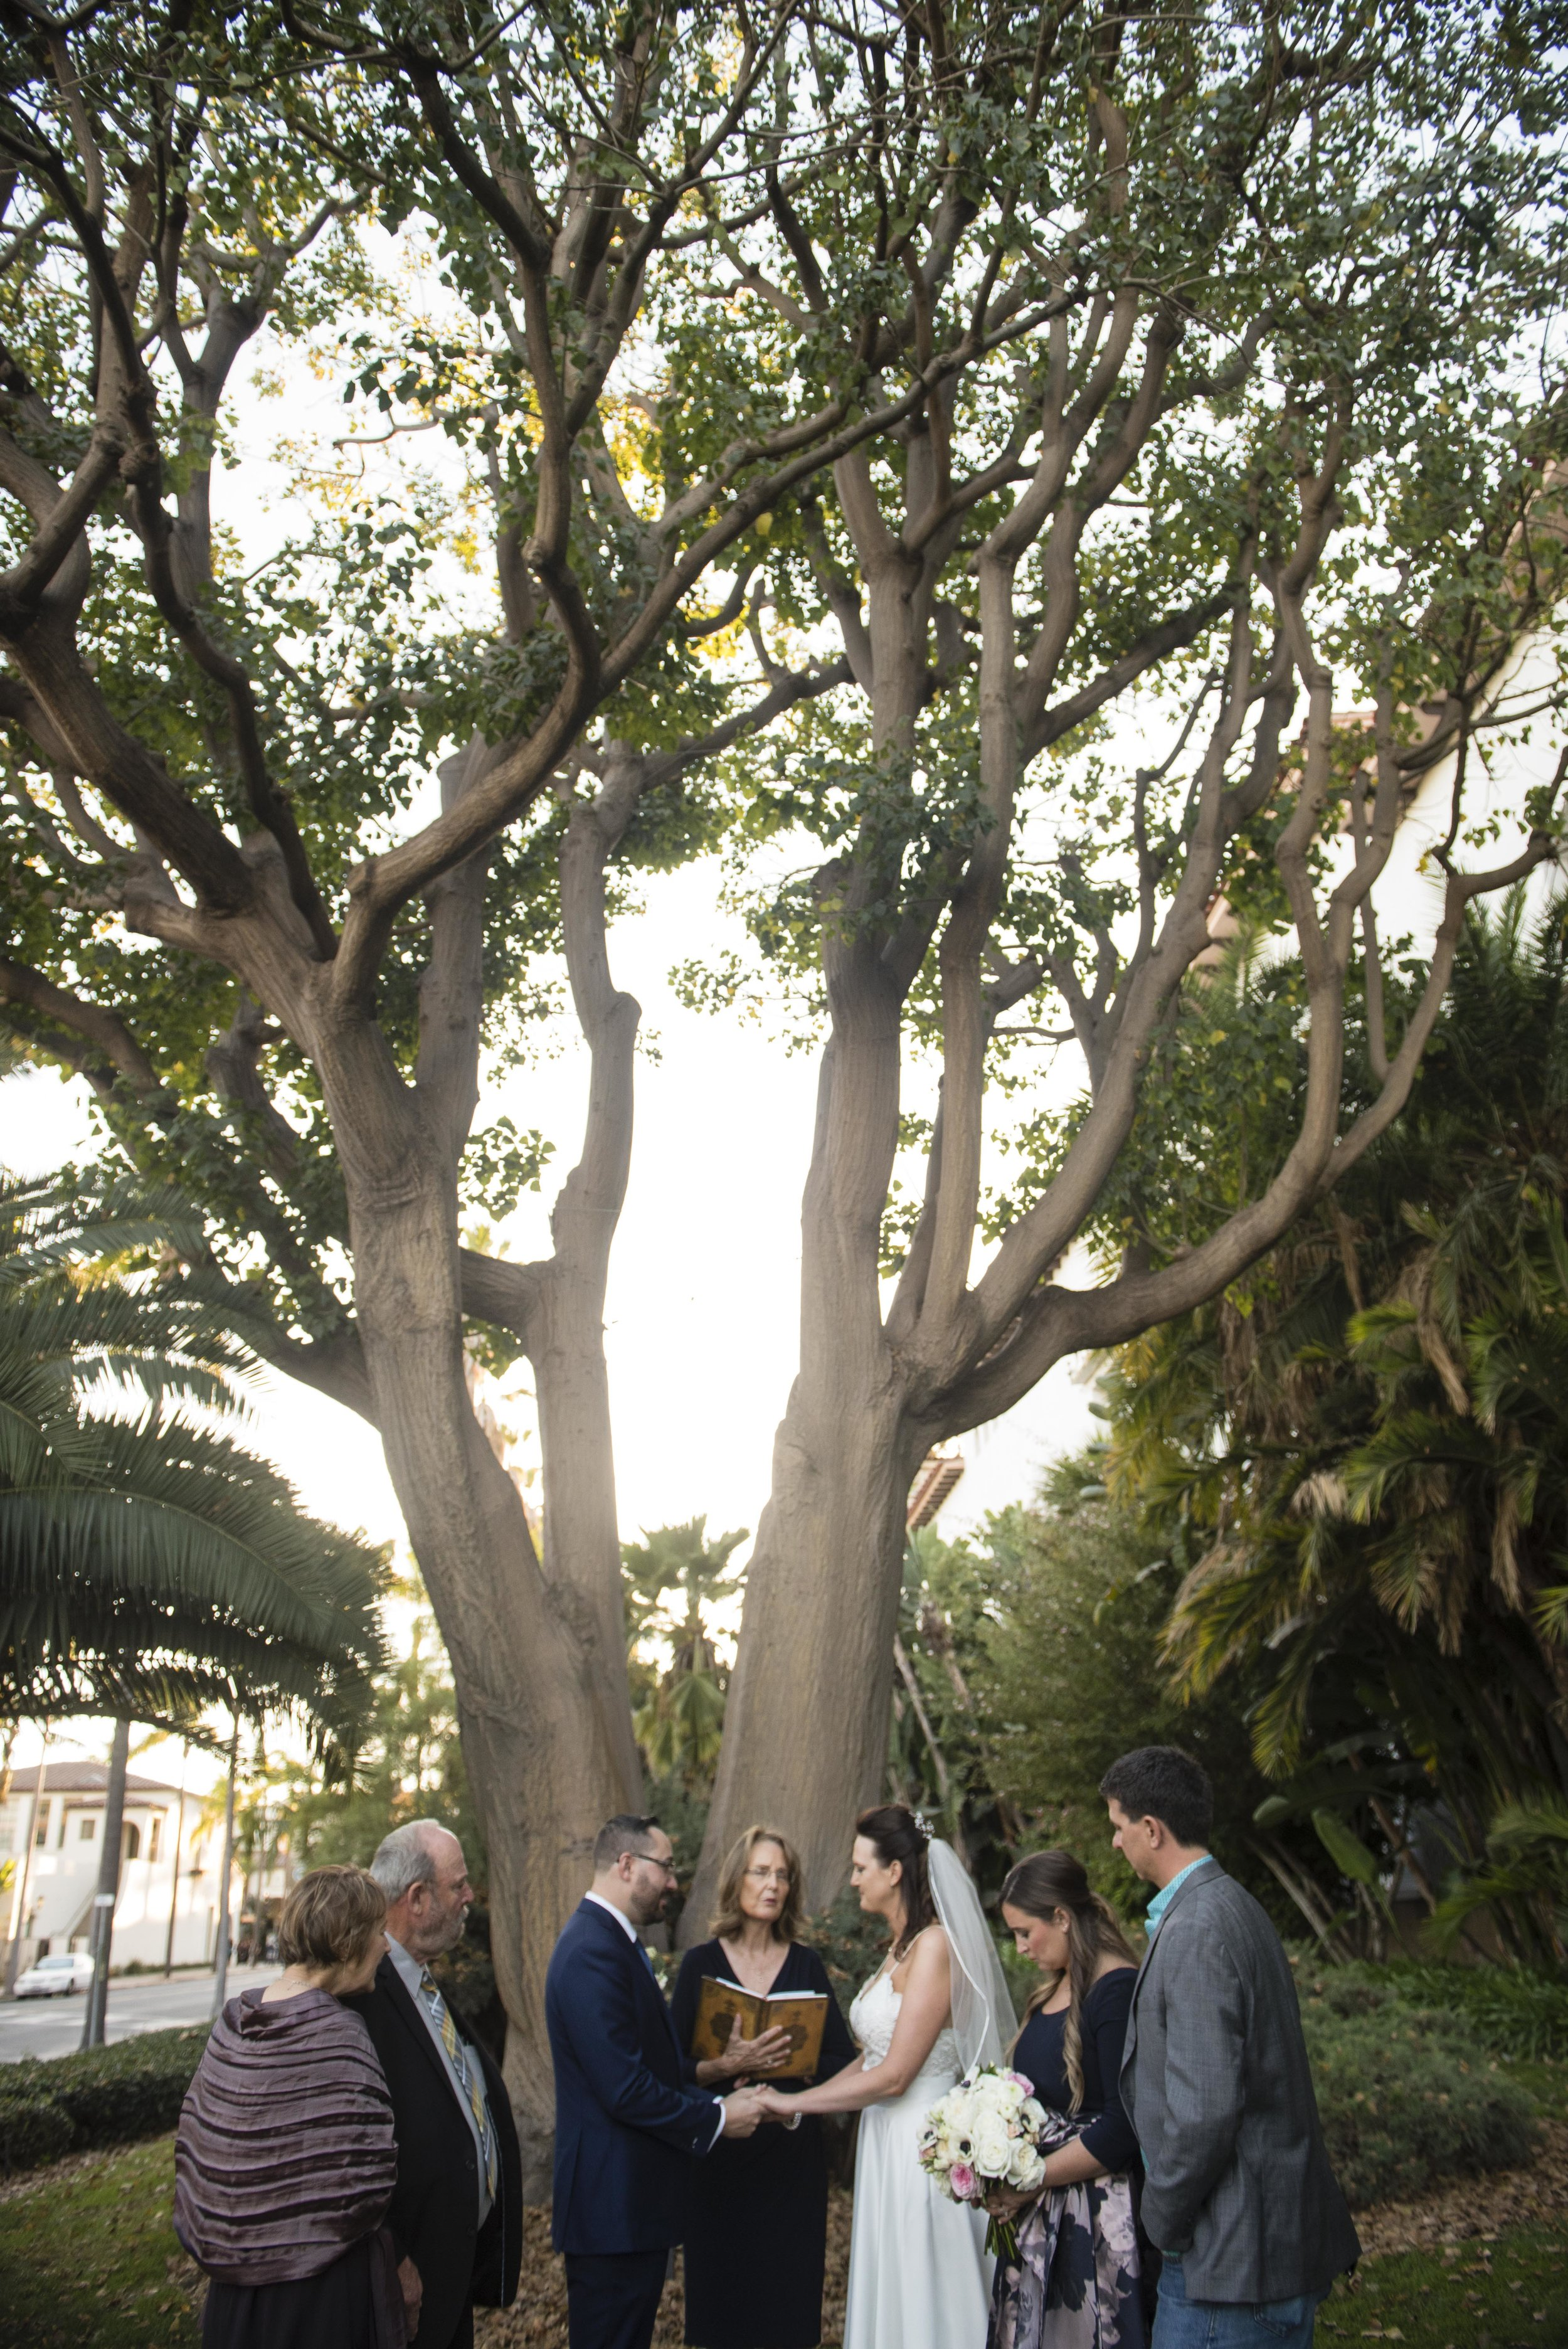 www.santabarbarawedding.com | By Cherry Photography | Santa Barbara Courthouse | Ceremony